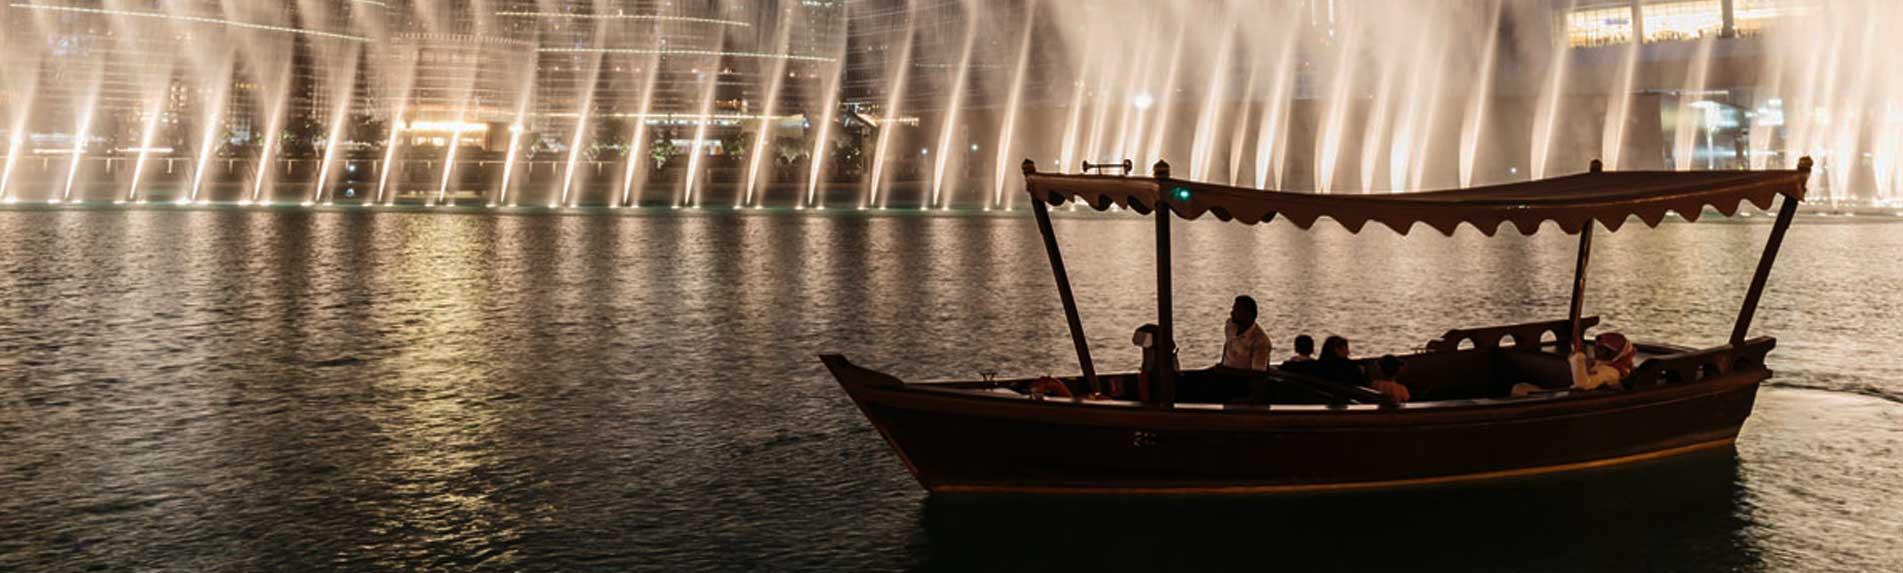 Dubai Fountain Lake